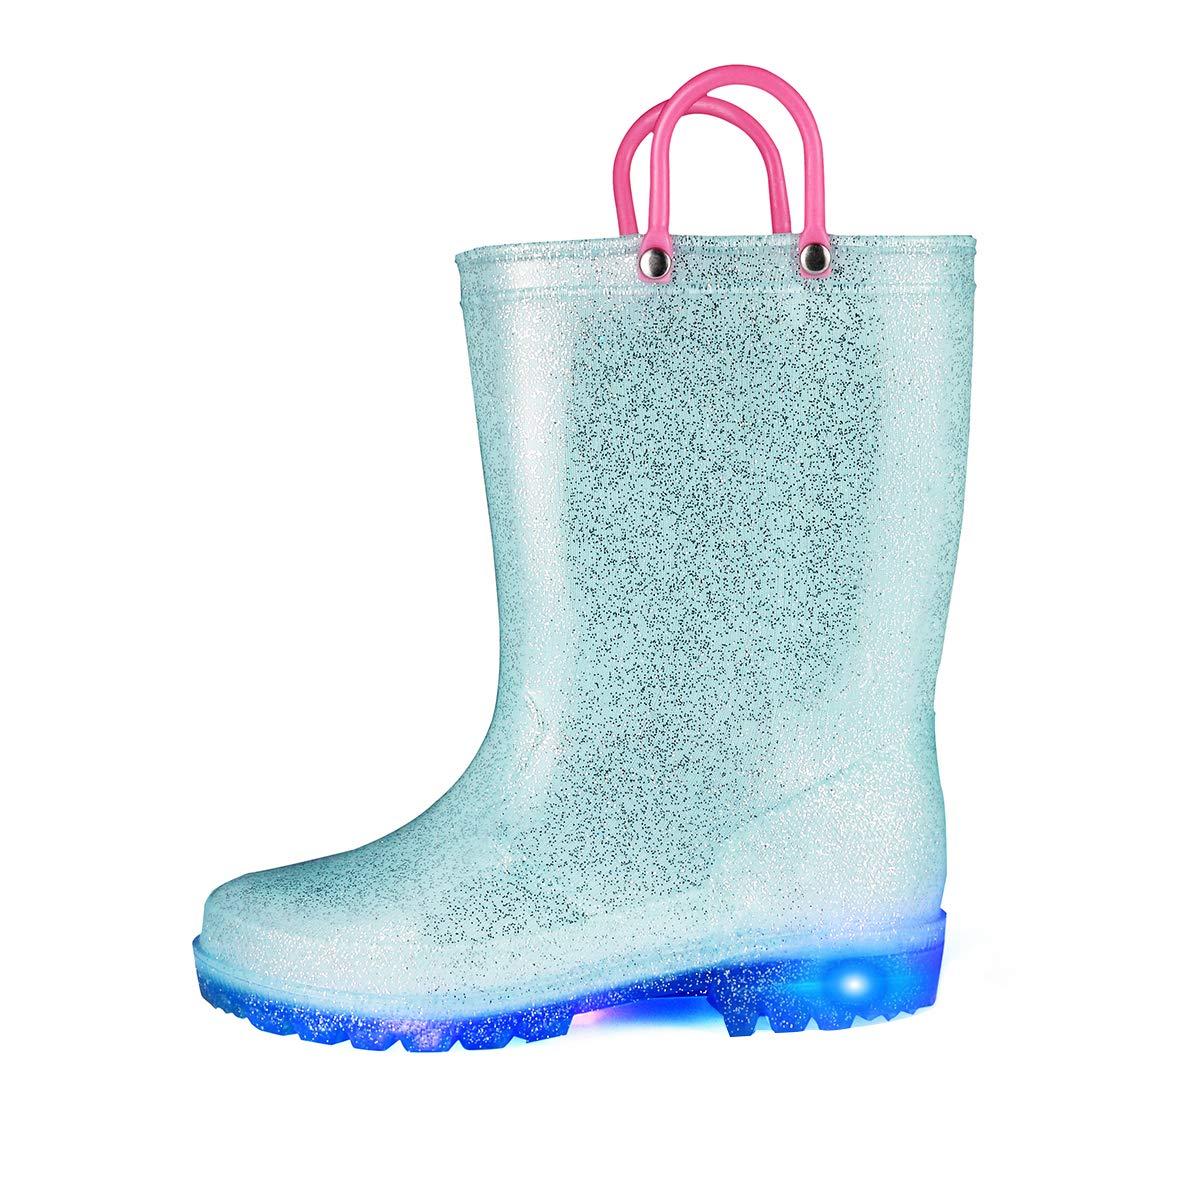 KomForme RPGL054-1M K Light Up Kids Rain Boots Glitter Girl Boots Blue by KomForme (Image #1)